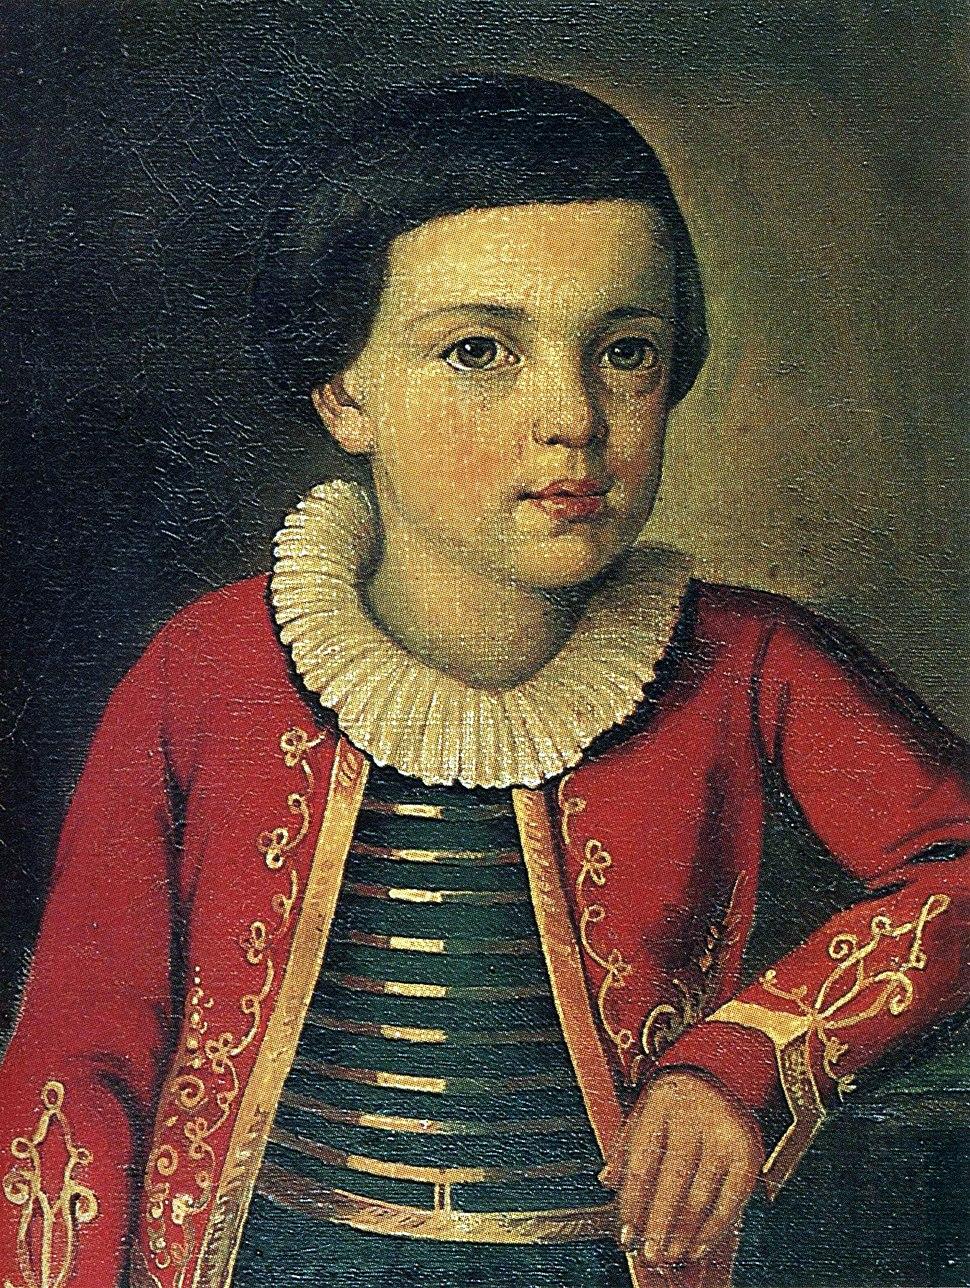 Mikhail Lermontov, 1820-22